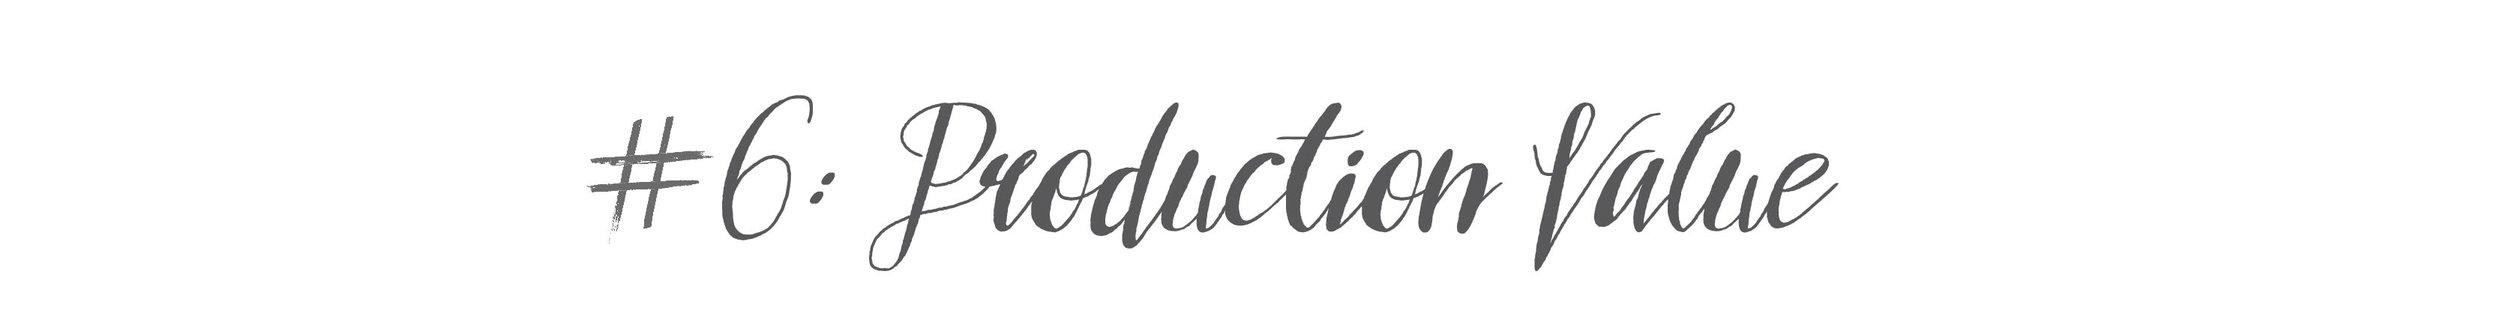 6-production-value.jpg